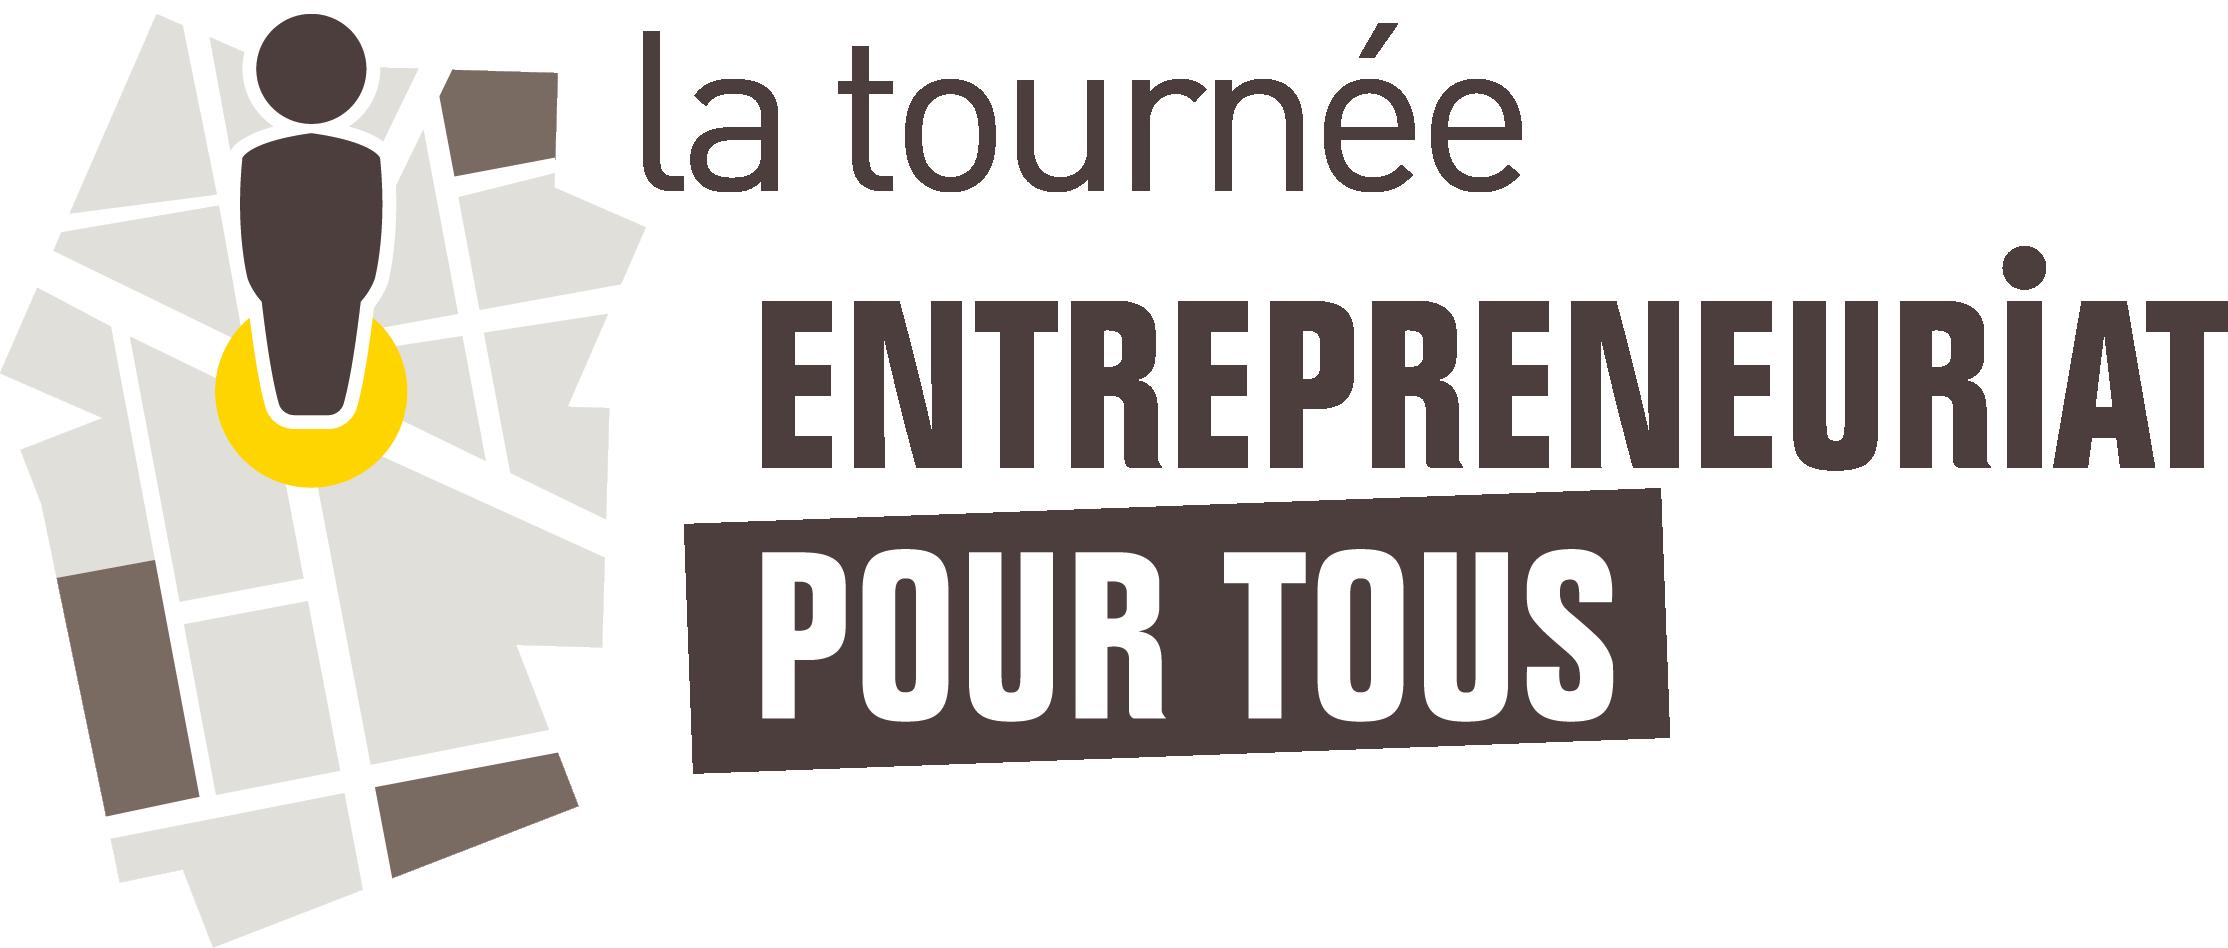 Tournée Entrepreneuriat Pour Tous